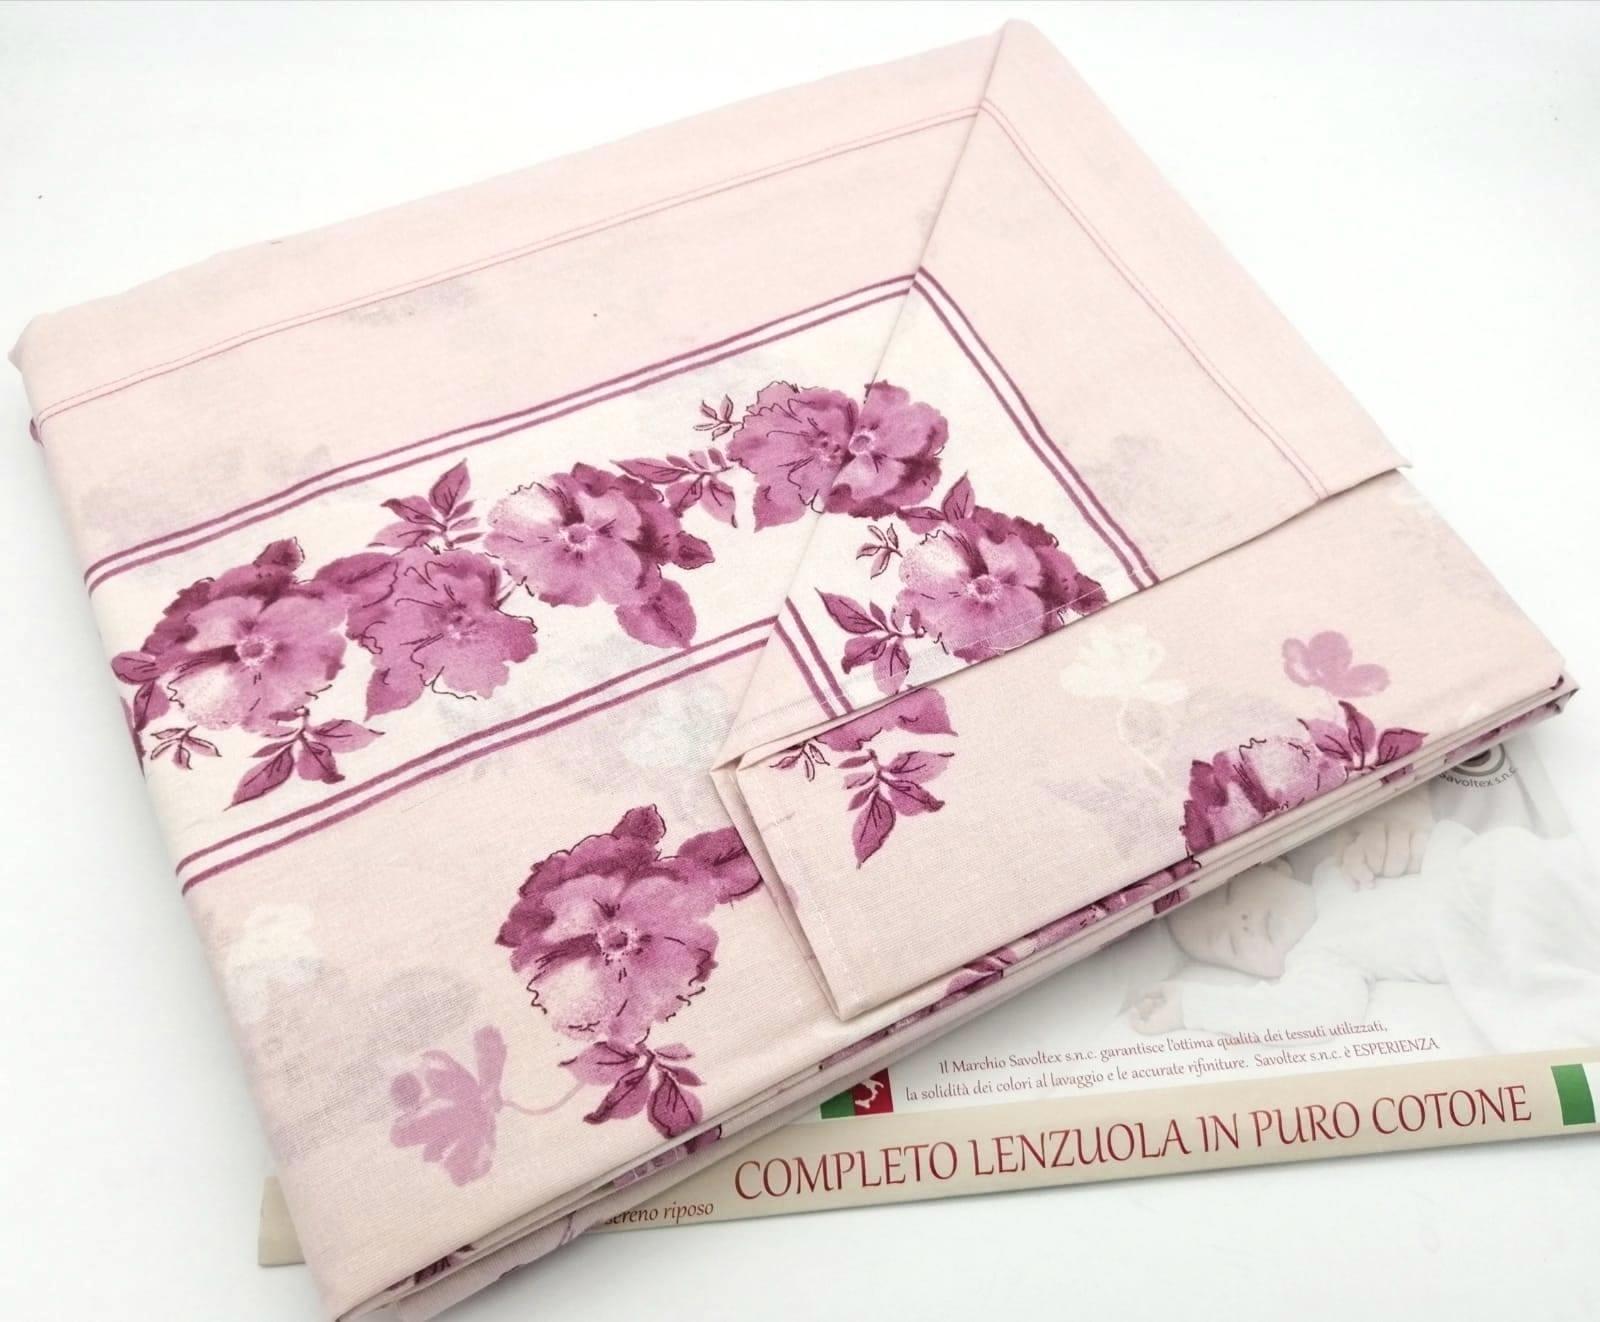 Lenzuola fiori violet